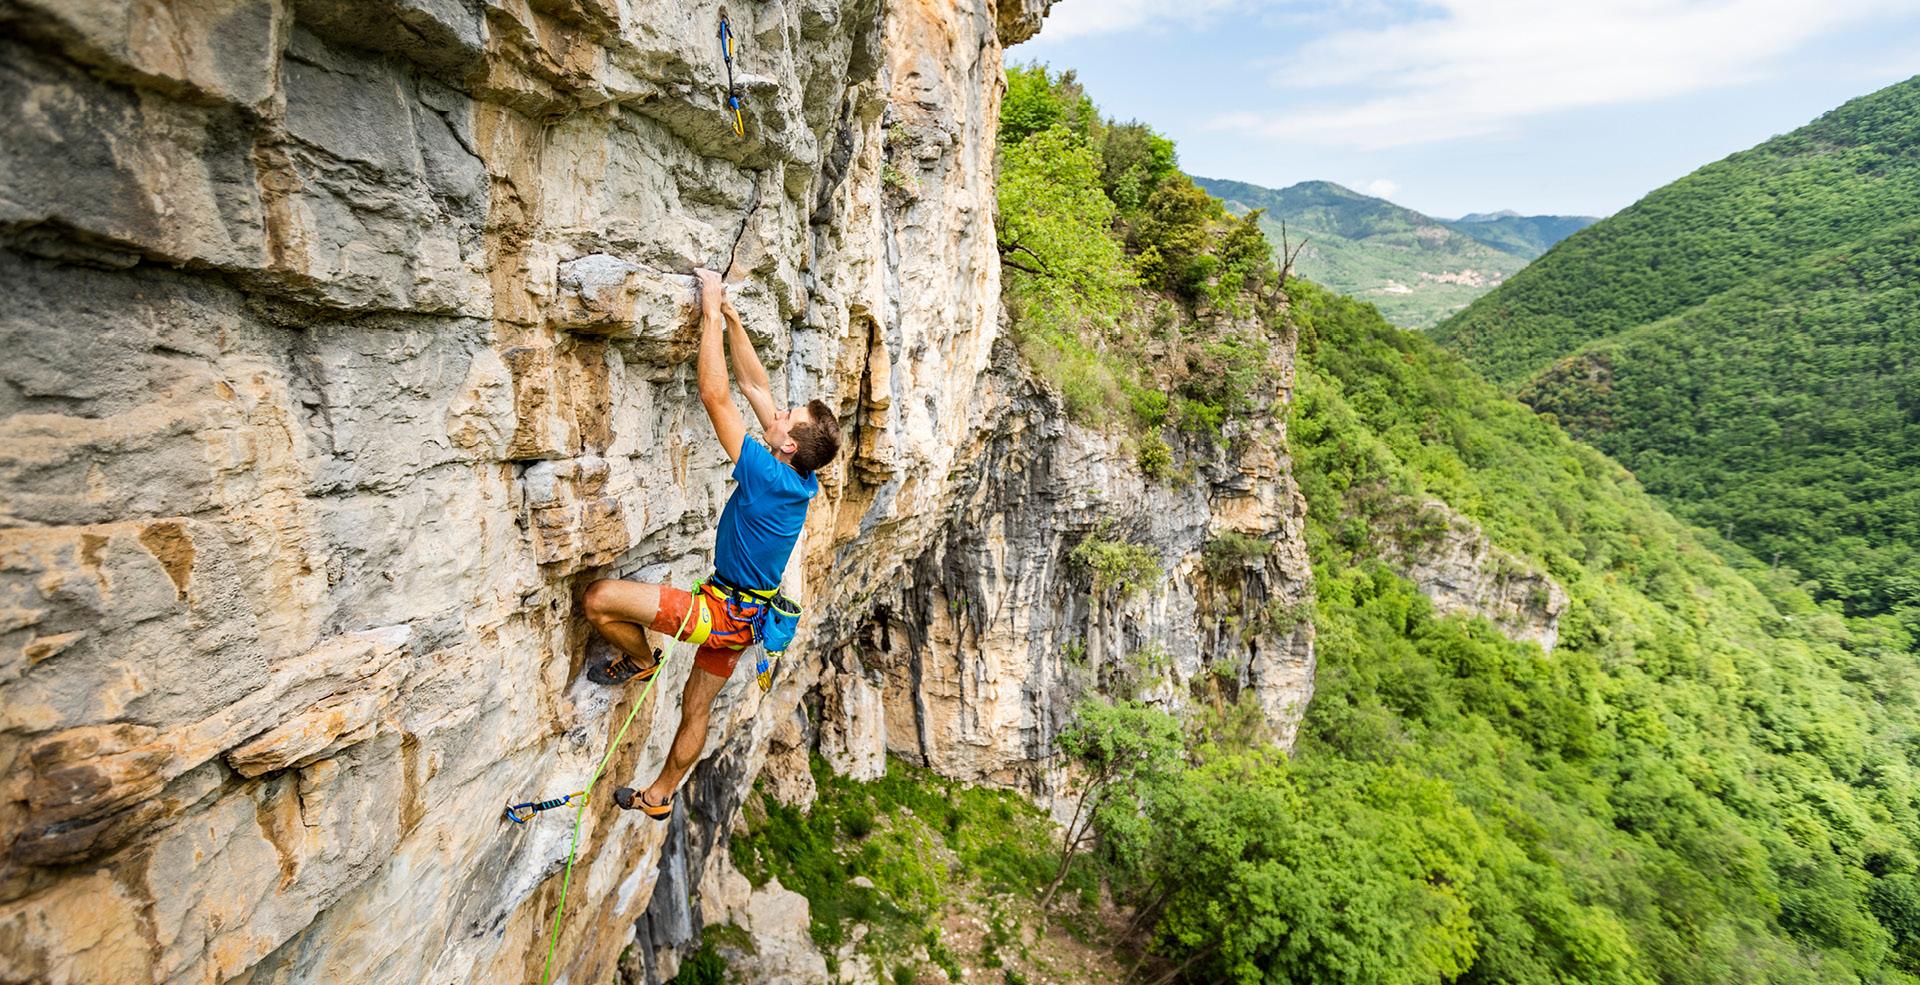 trip to climb|climbing travel planner app